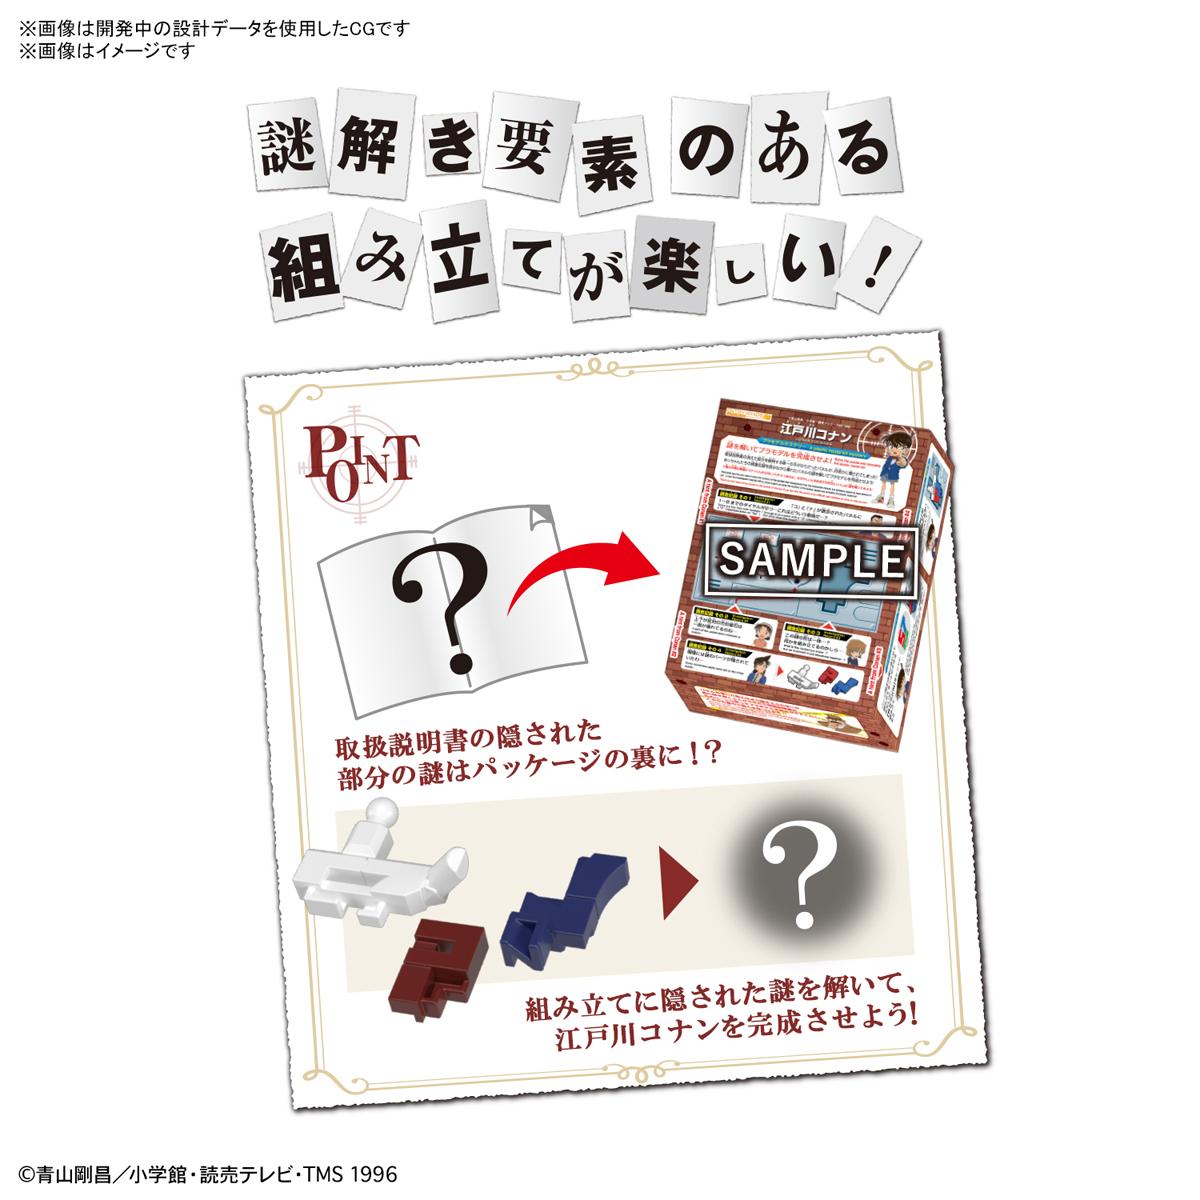 ENTRY GRADE『江戸川コナン』名探偵コナン プラモデル-006